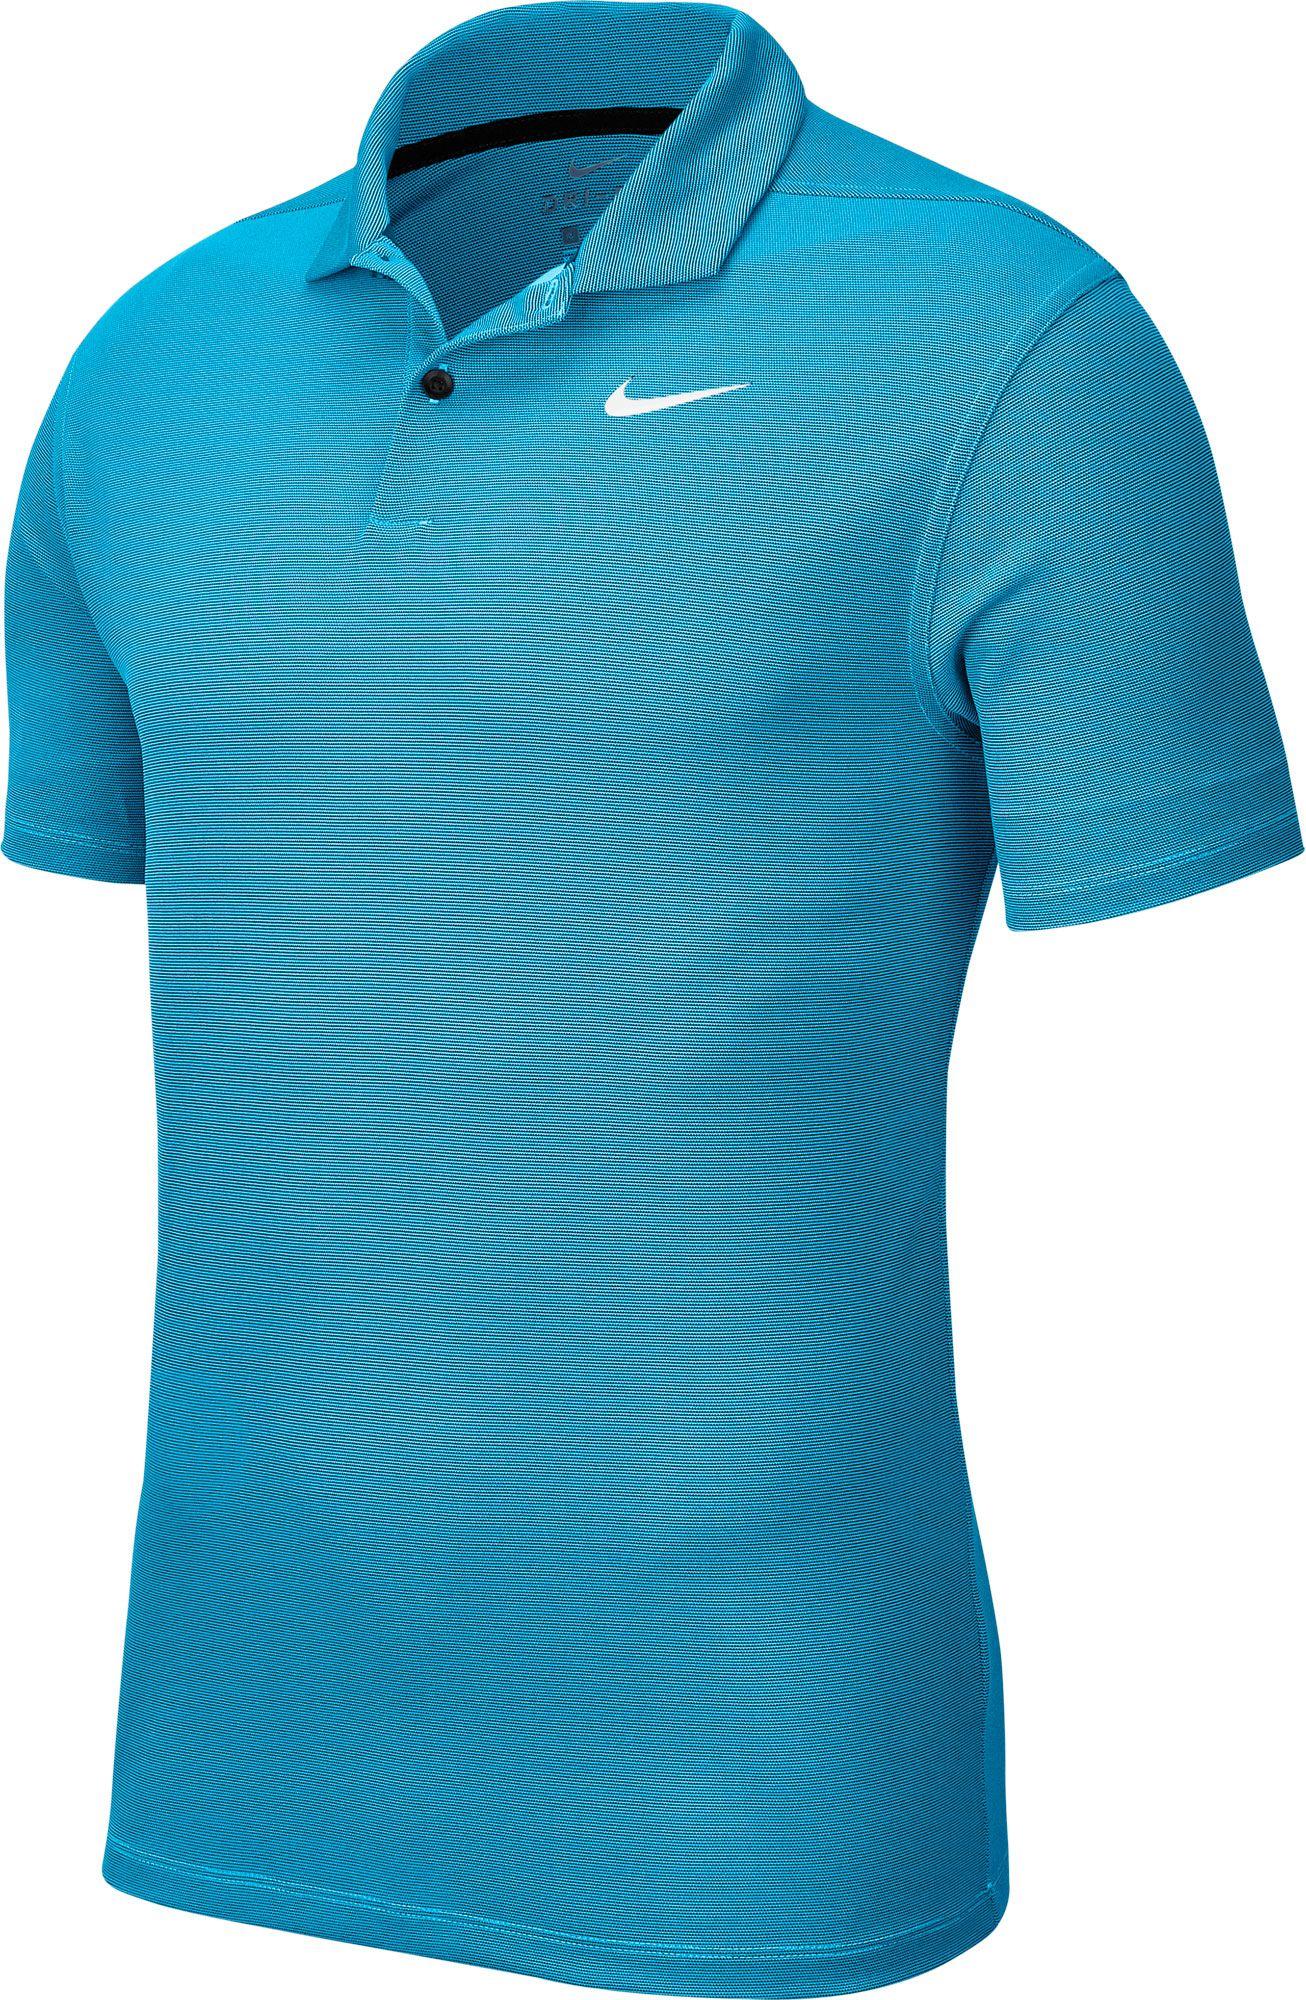 What is a Golf Shirt - Nike Golf Polo